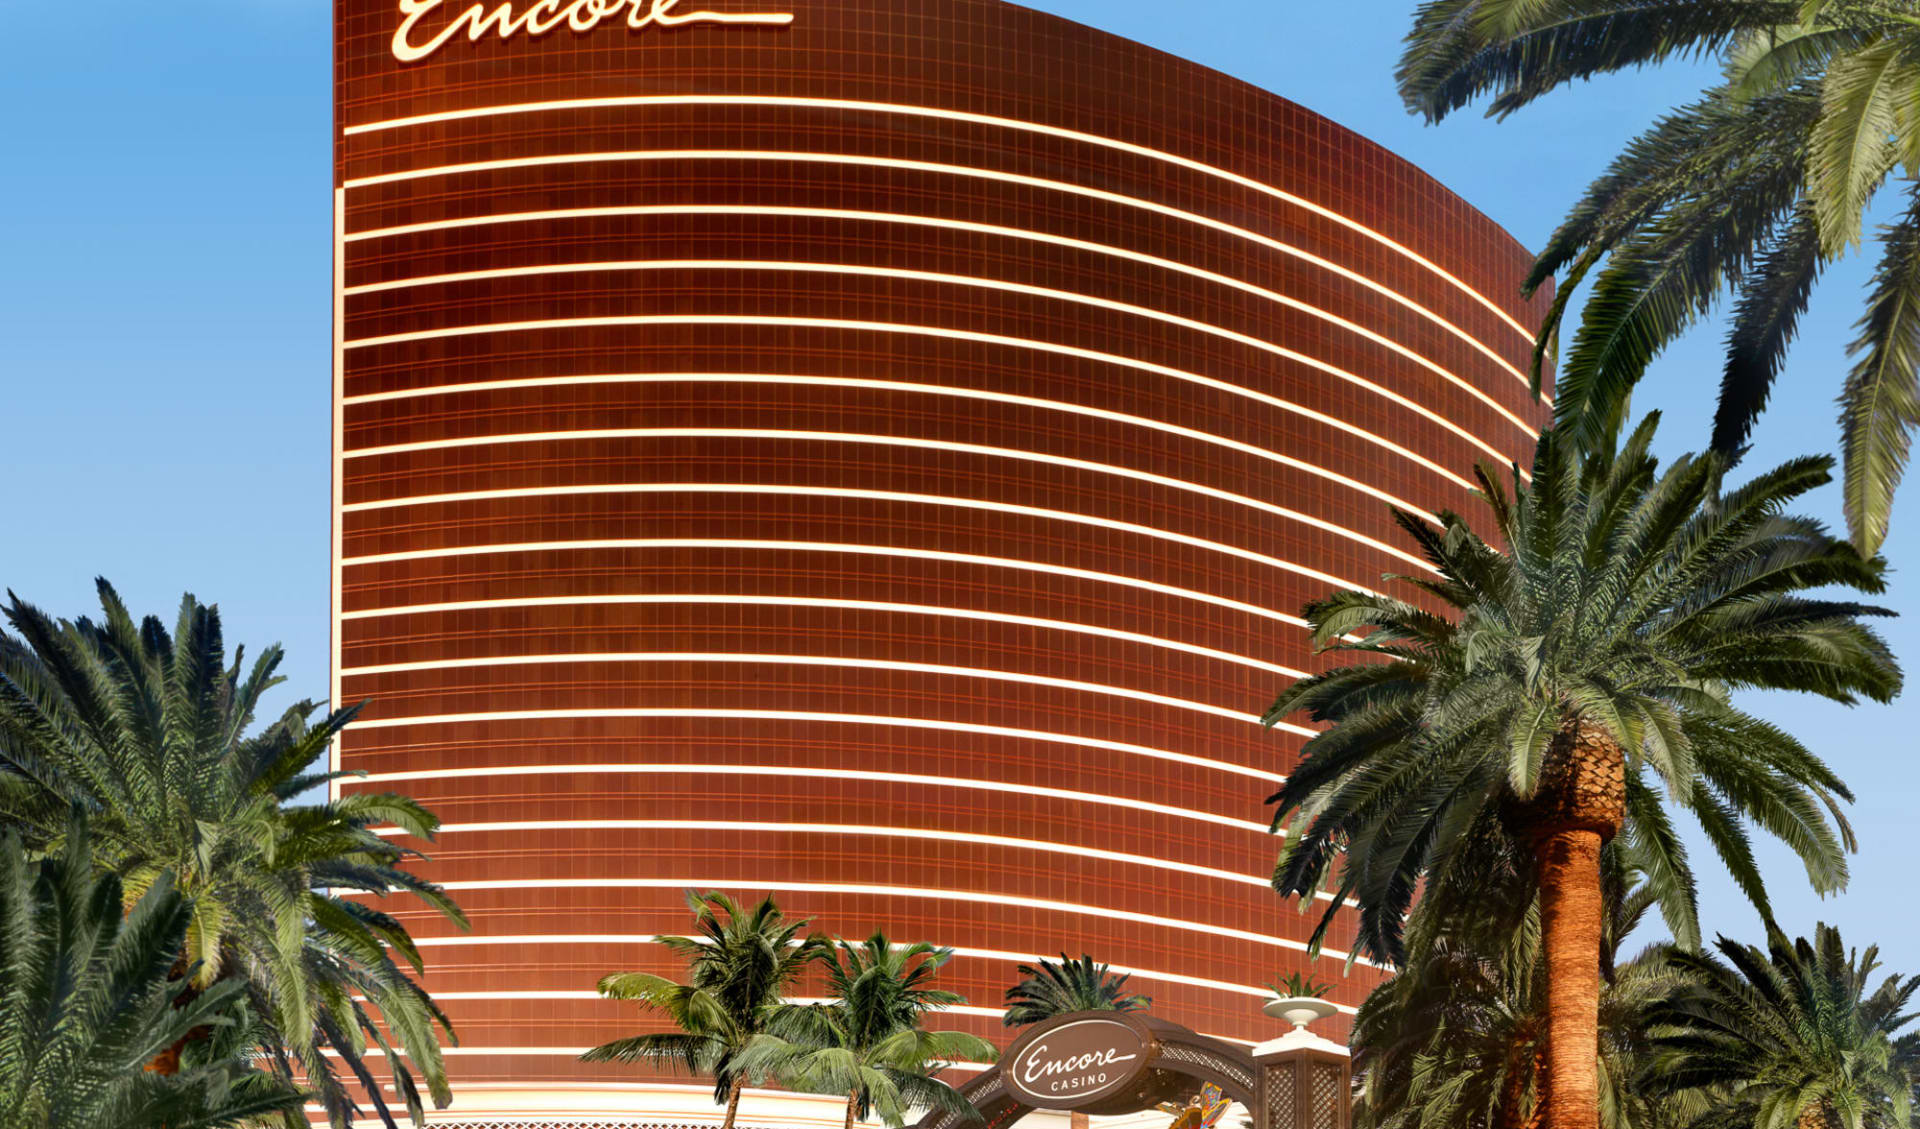 Encore at Wynn Las Vegas:  Encore at Wynn - Foto von Gebäude